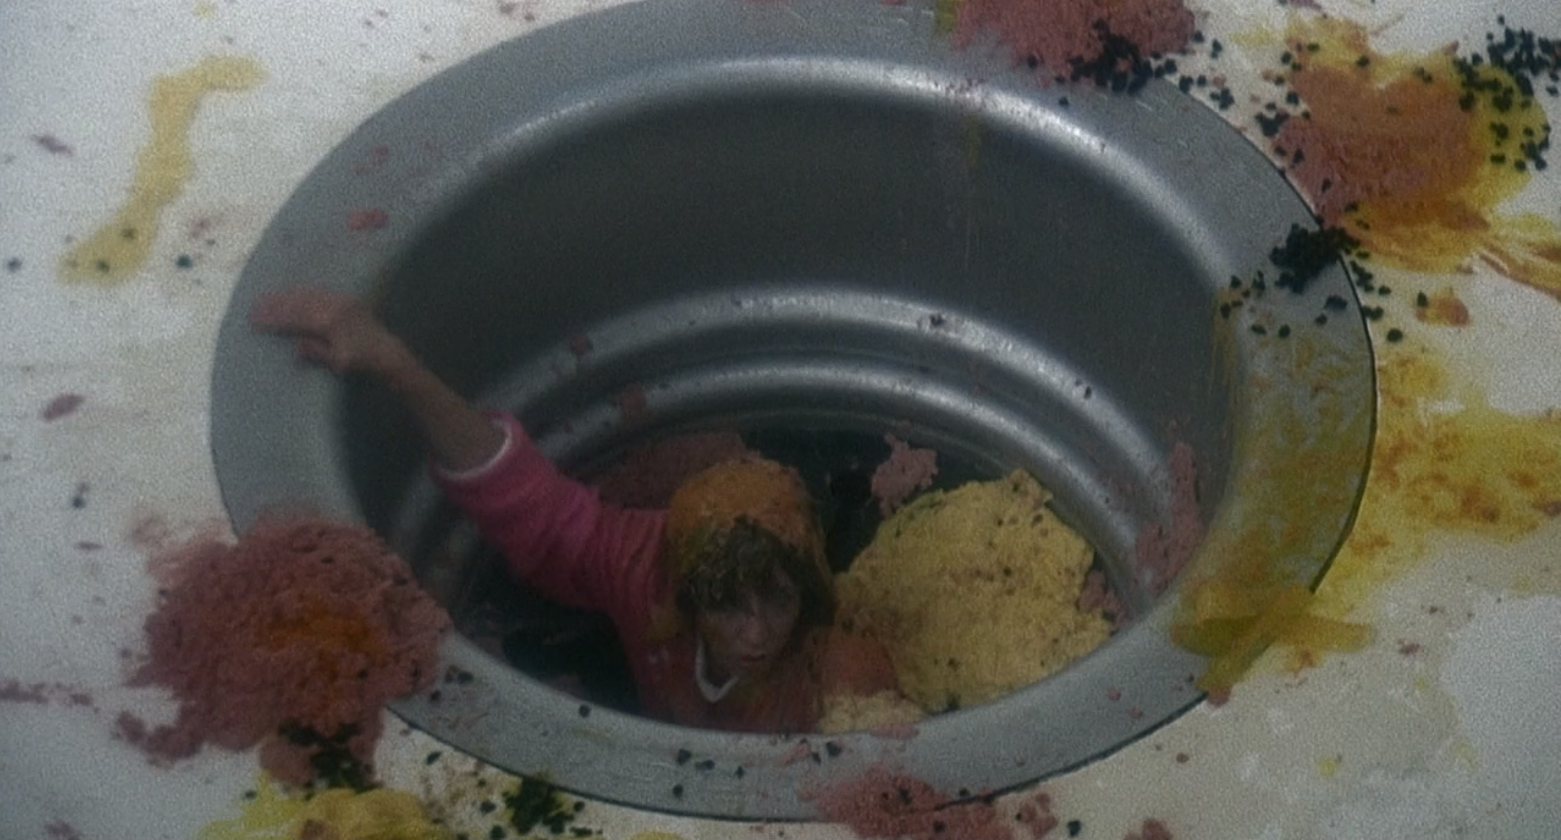 Lily Tomlin Incredible Shrinking Woman Garbage Disposal